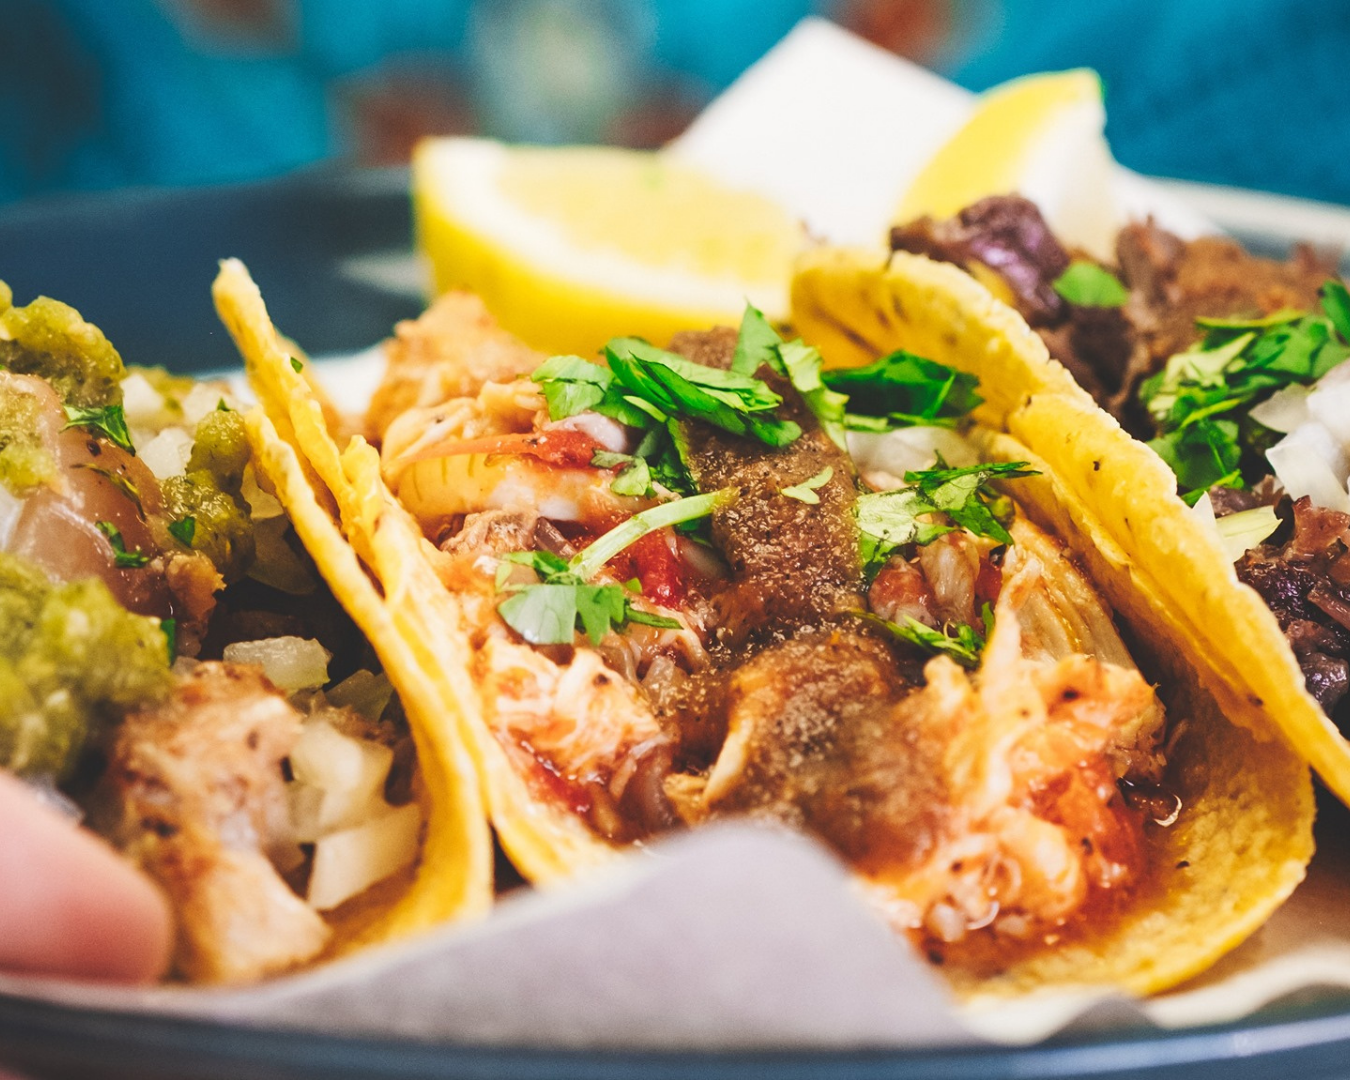 A close up shots of tacos served in La Mexicana